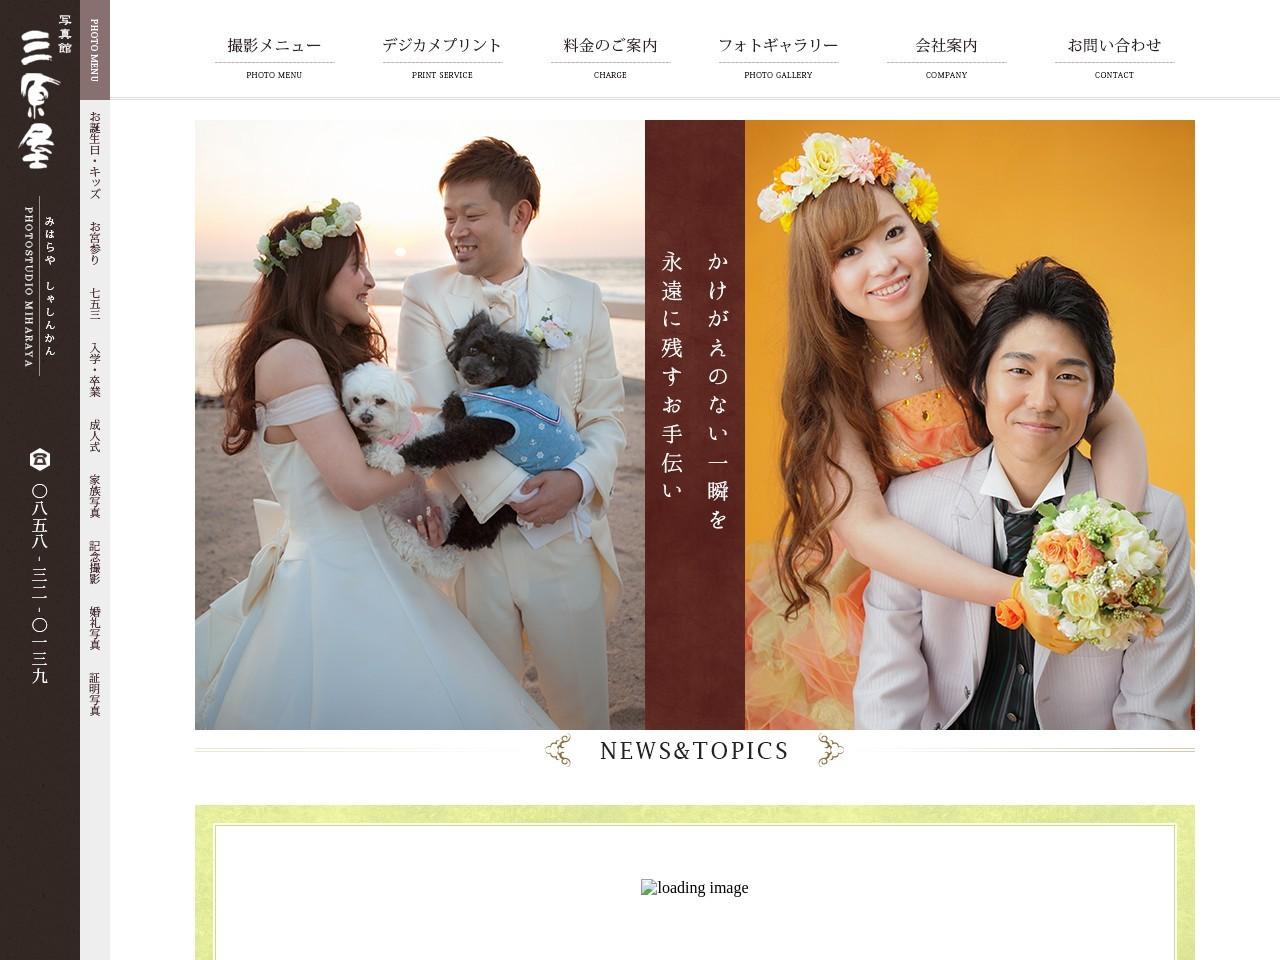 三原屋写真館│鳥取県湯梨浜町の写真屋さん